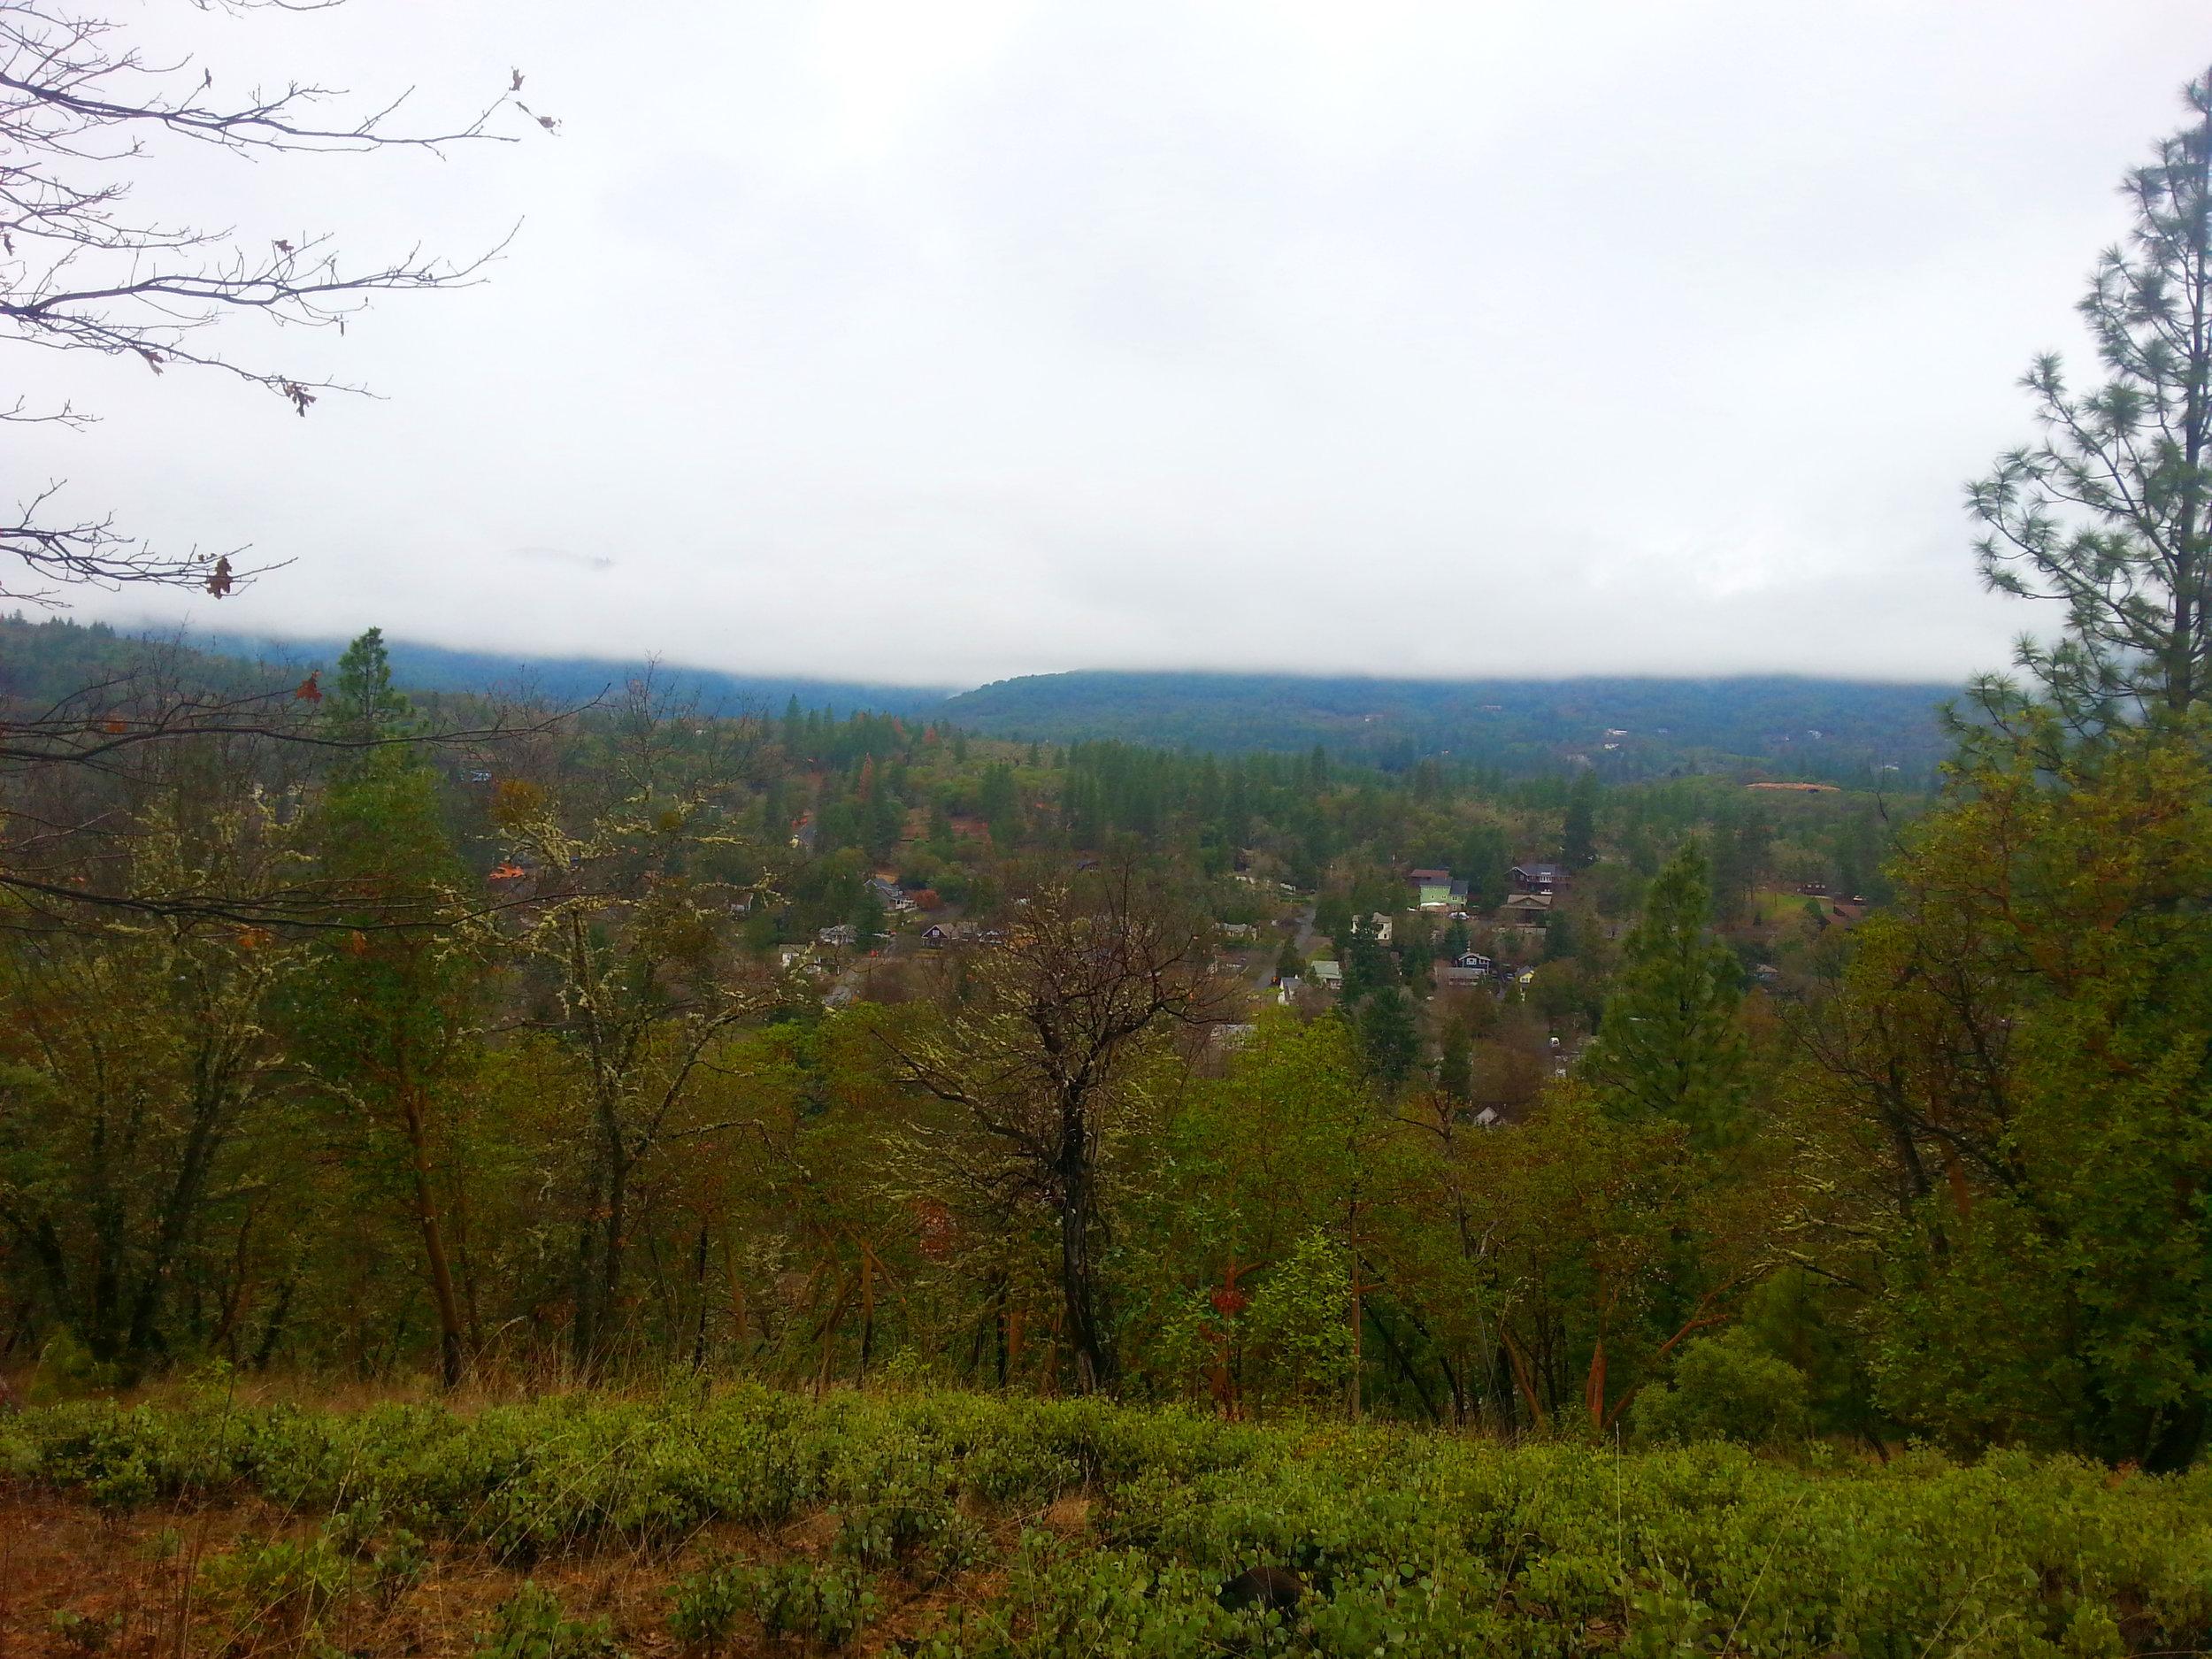 Beekman Trail, Jacksonville, Oregon - Rogue Valley - Jackson County - Southern Oregon (4).jpg